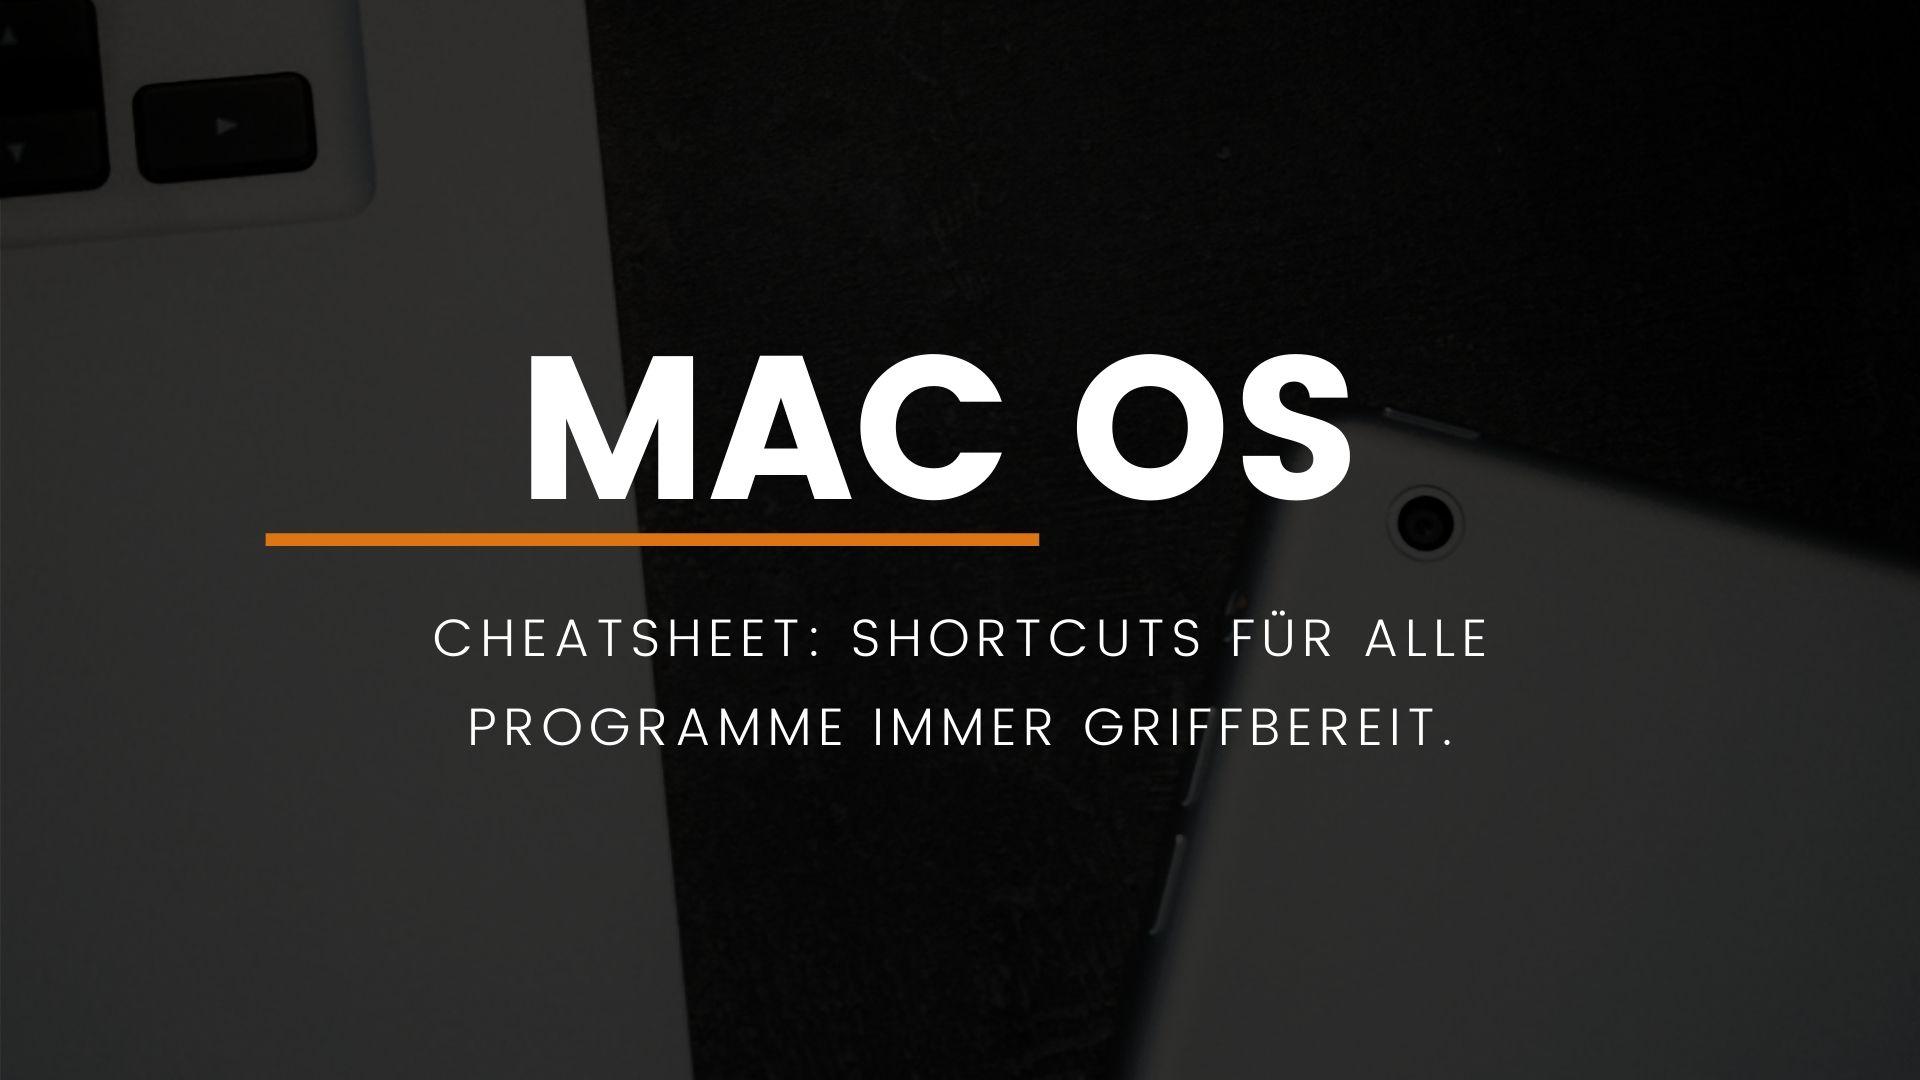 macOS-shortcuts-cheatsheet